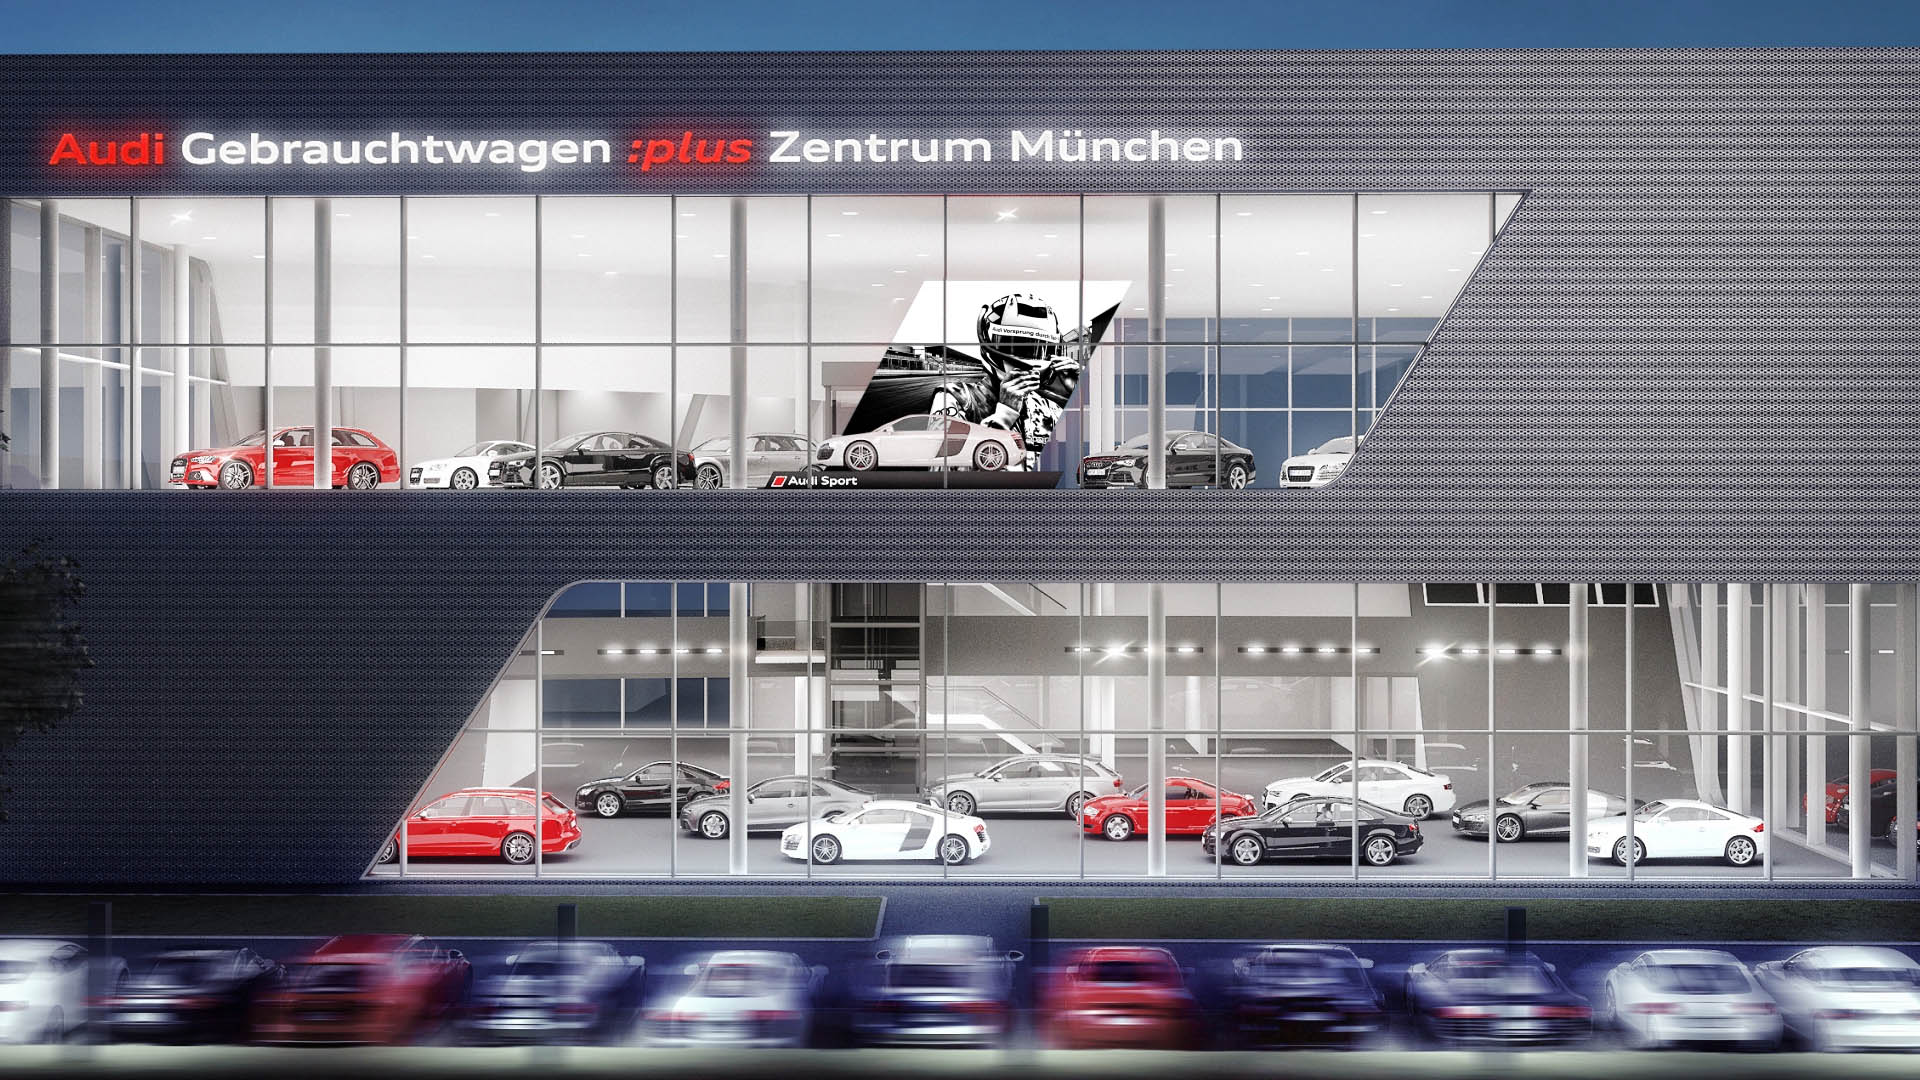 Audi Gwz Miasanso